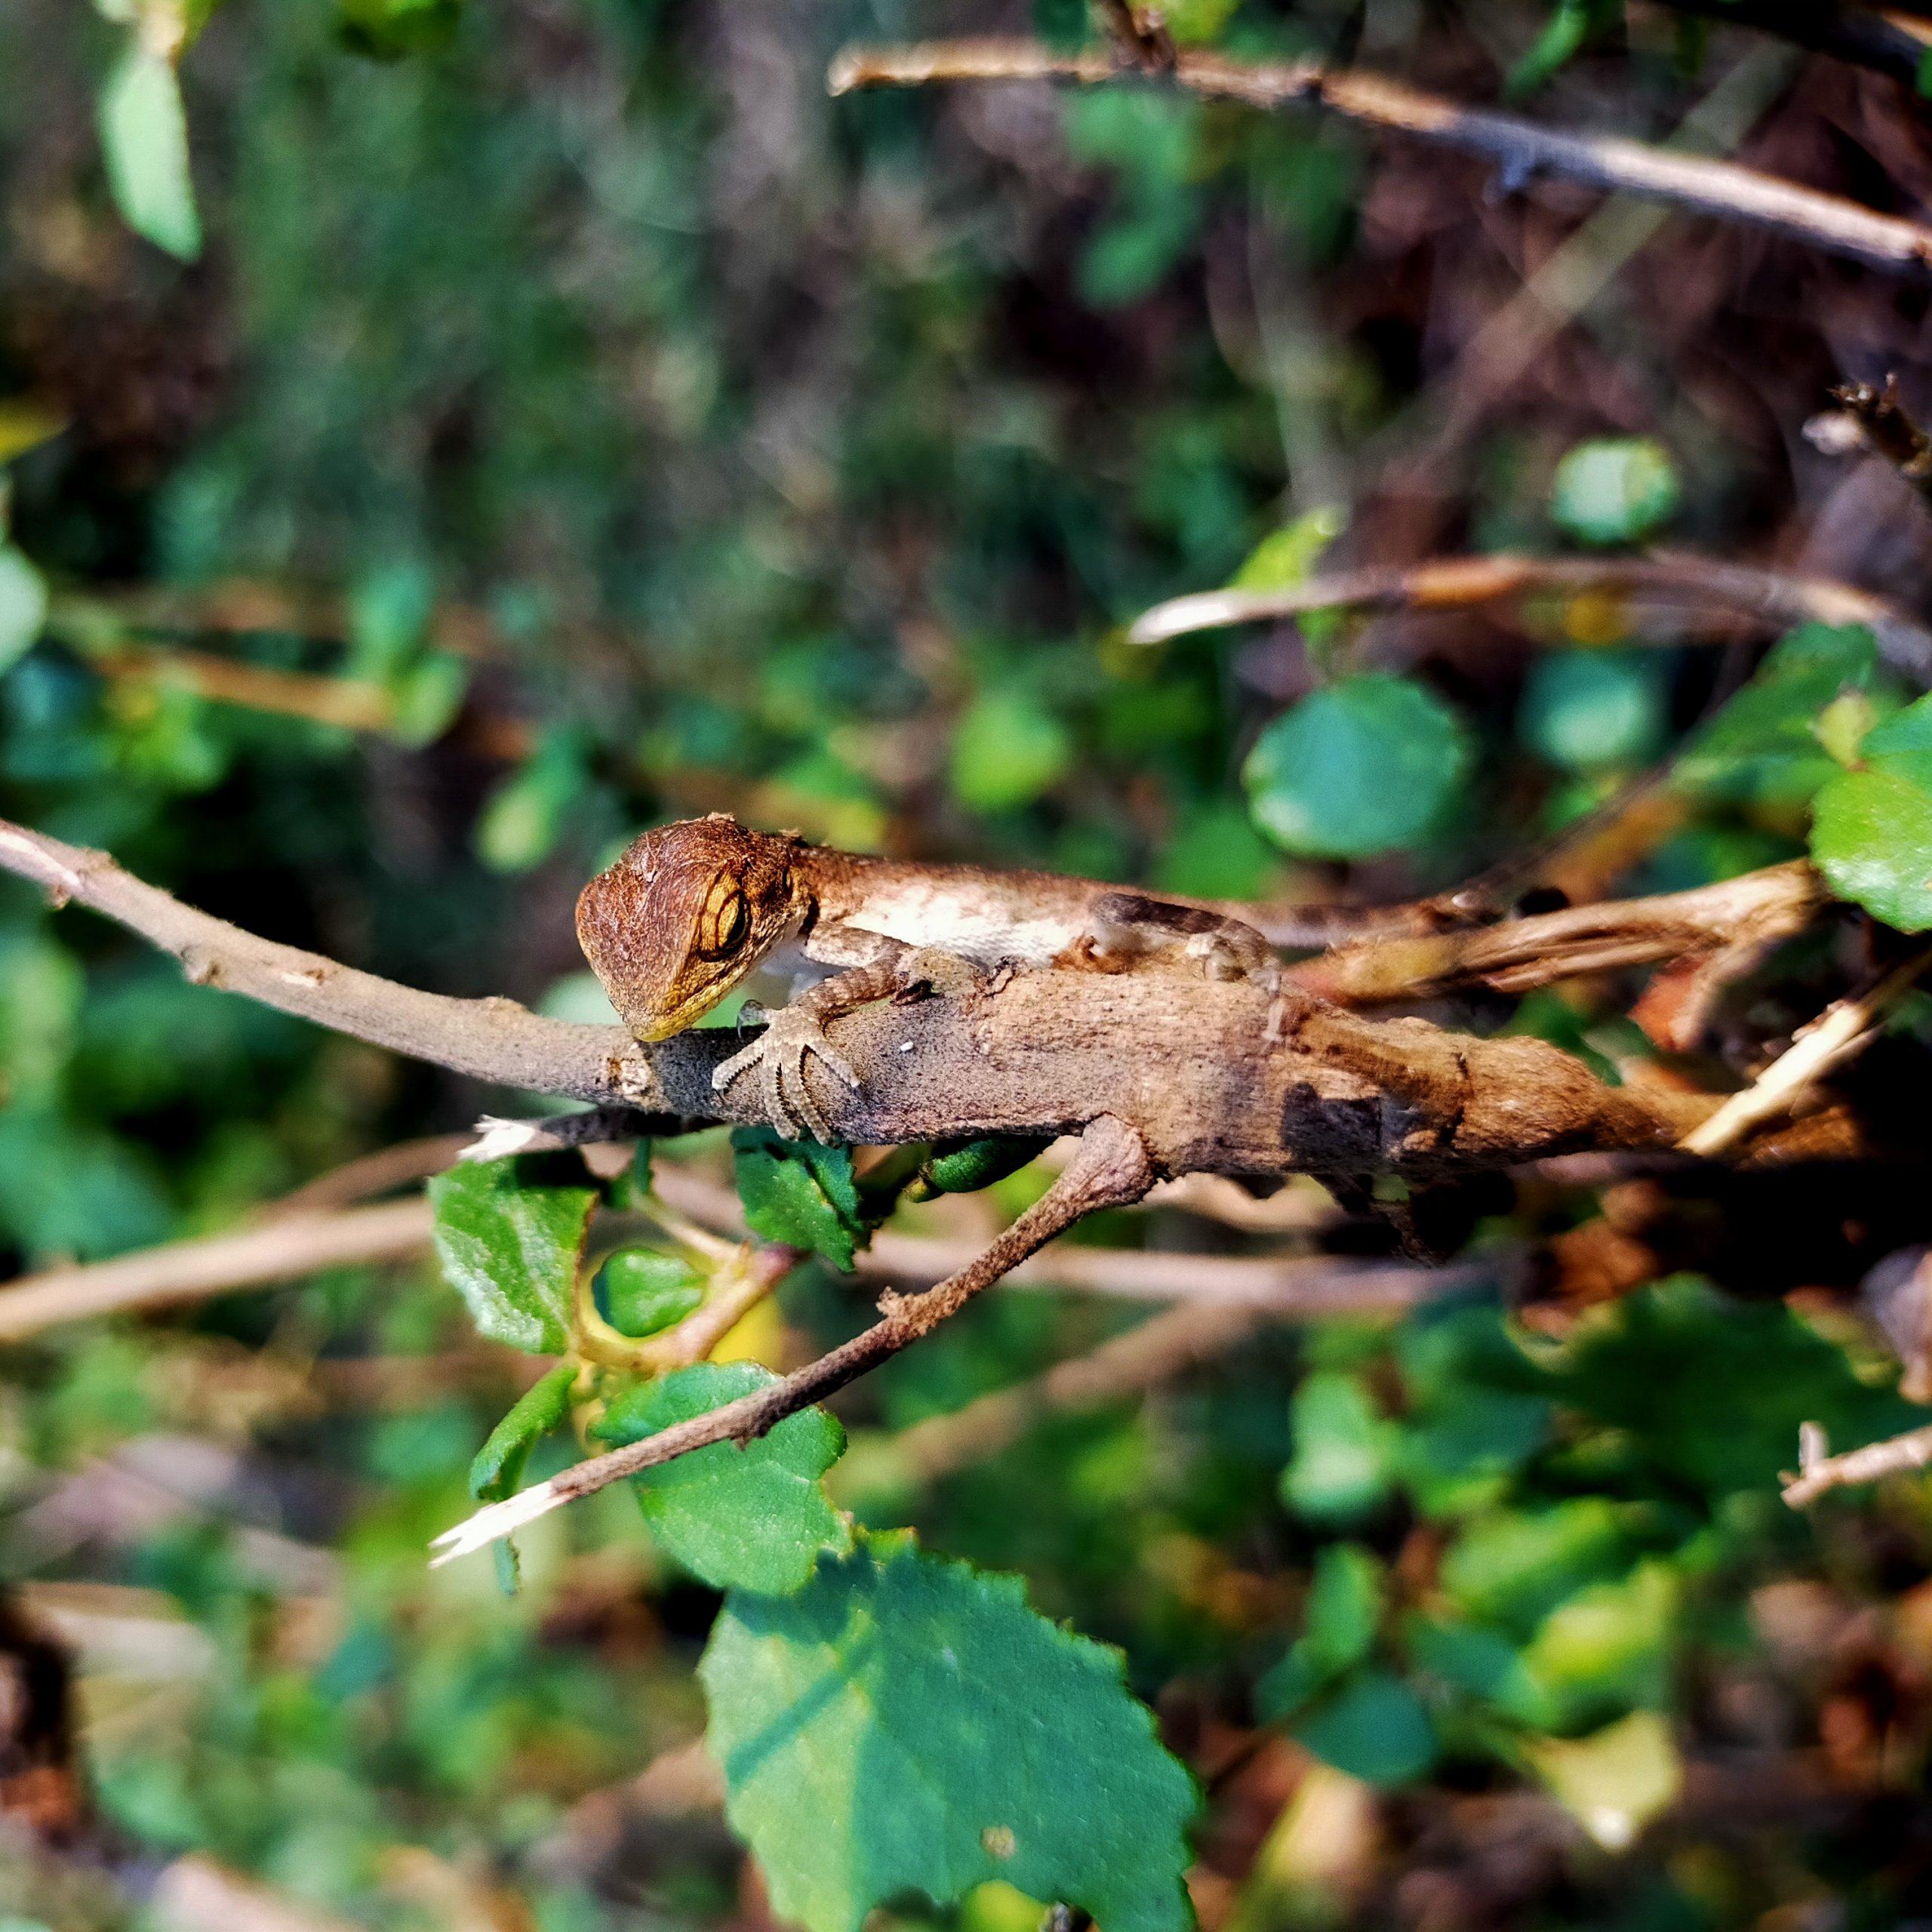 Lizard sitting on a branch